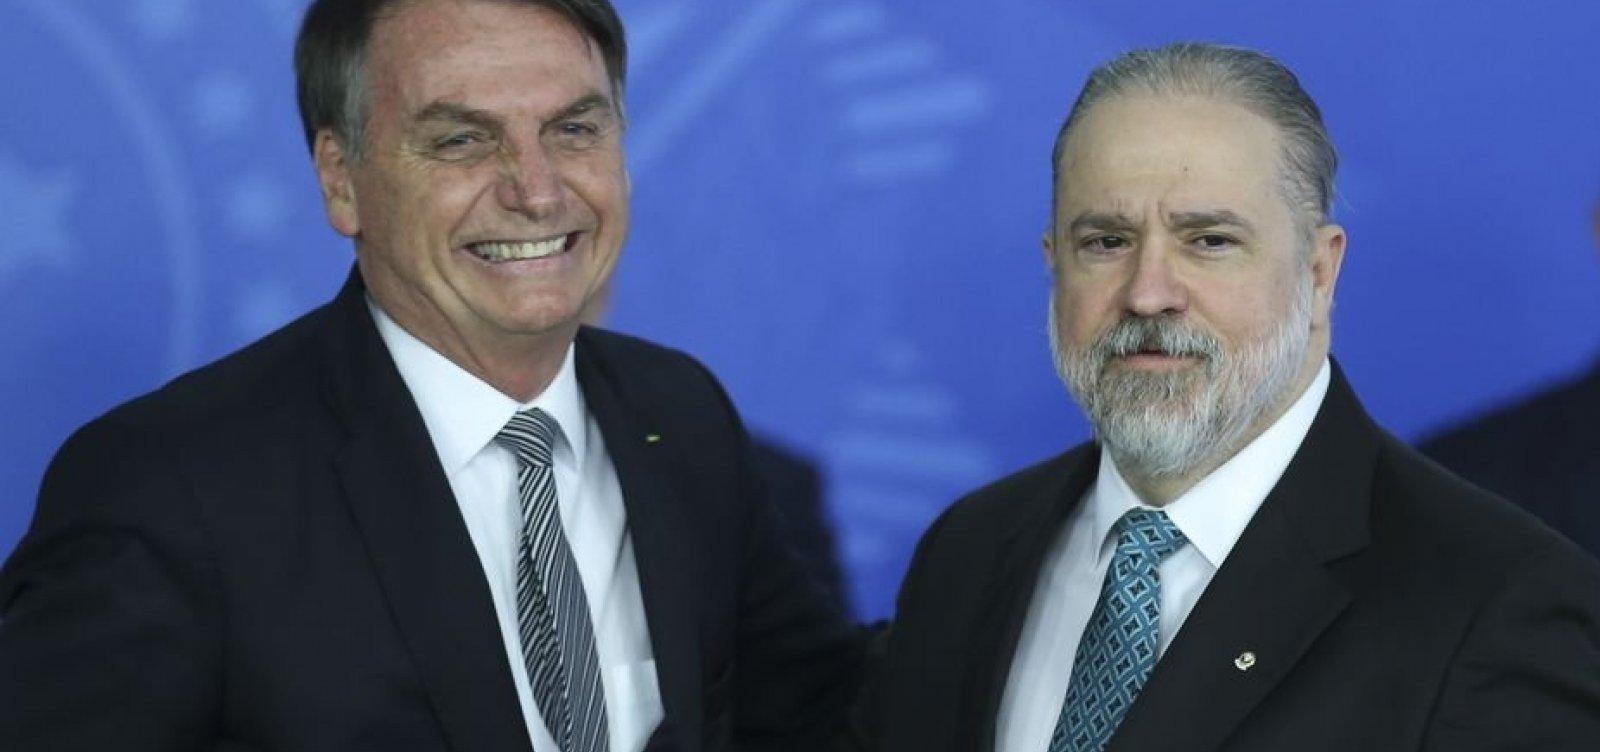 PGR não vai denunciar Bolsonaro por caso Covaxin, crava site de investidores